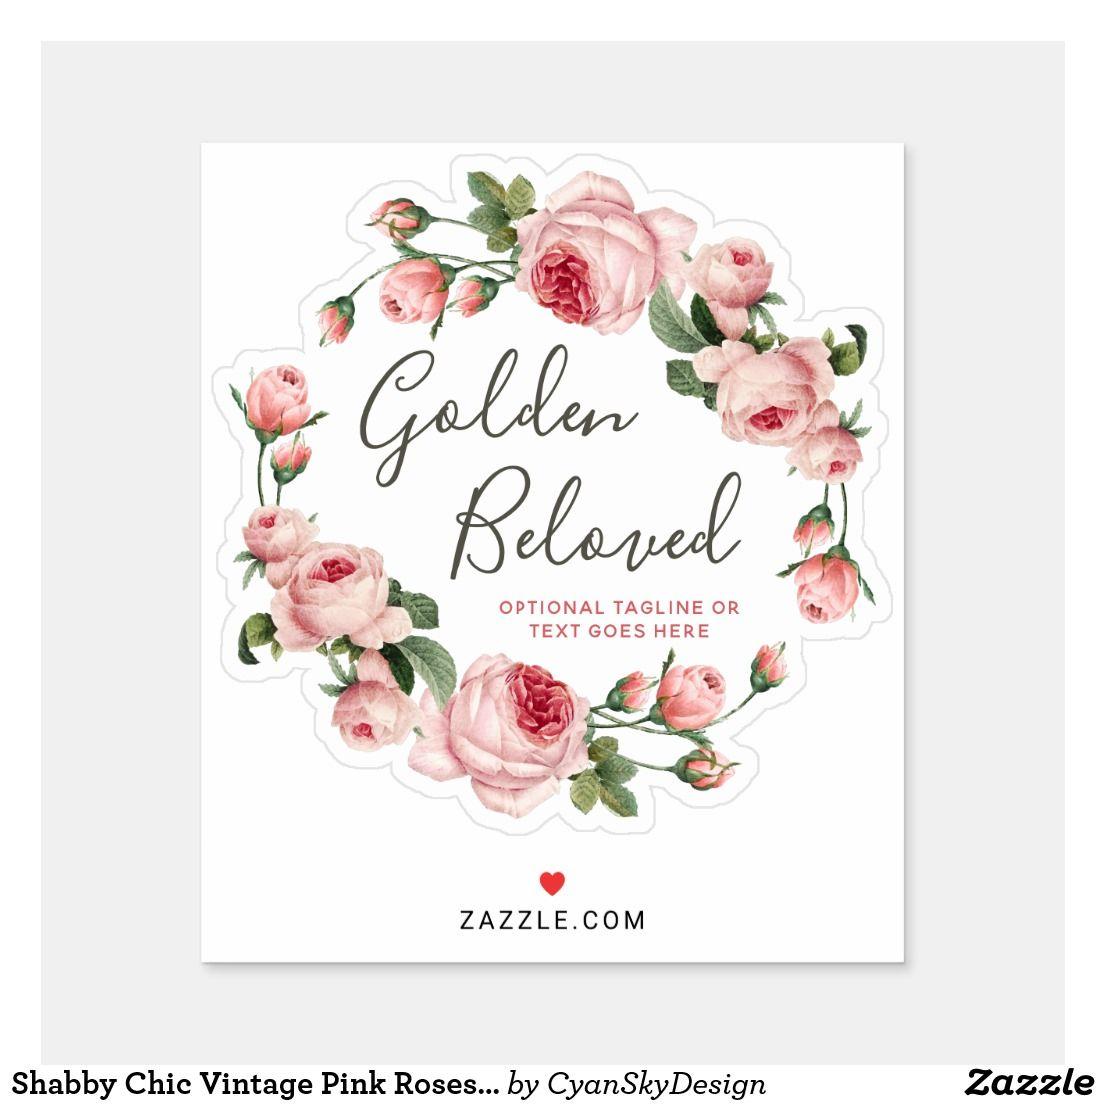 Shabby Chic Vintage Pink Roses Circle Logo Name Sticker Zazzle Com Vintage Pink Vintage Chic Shabby Chic Logo